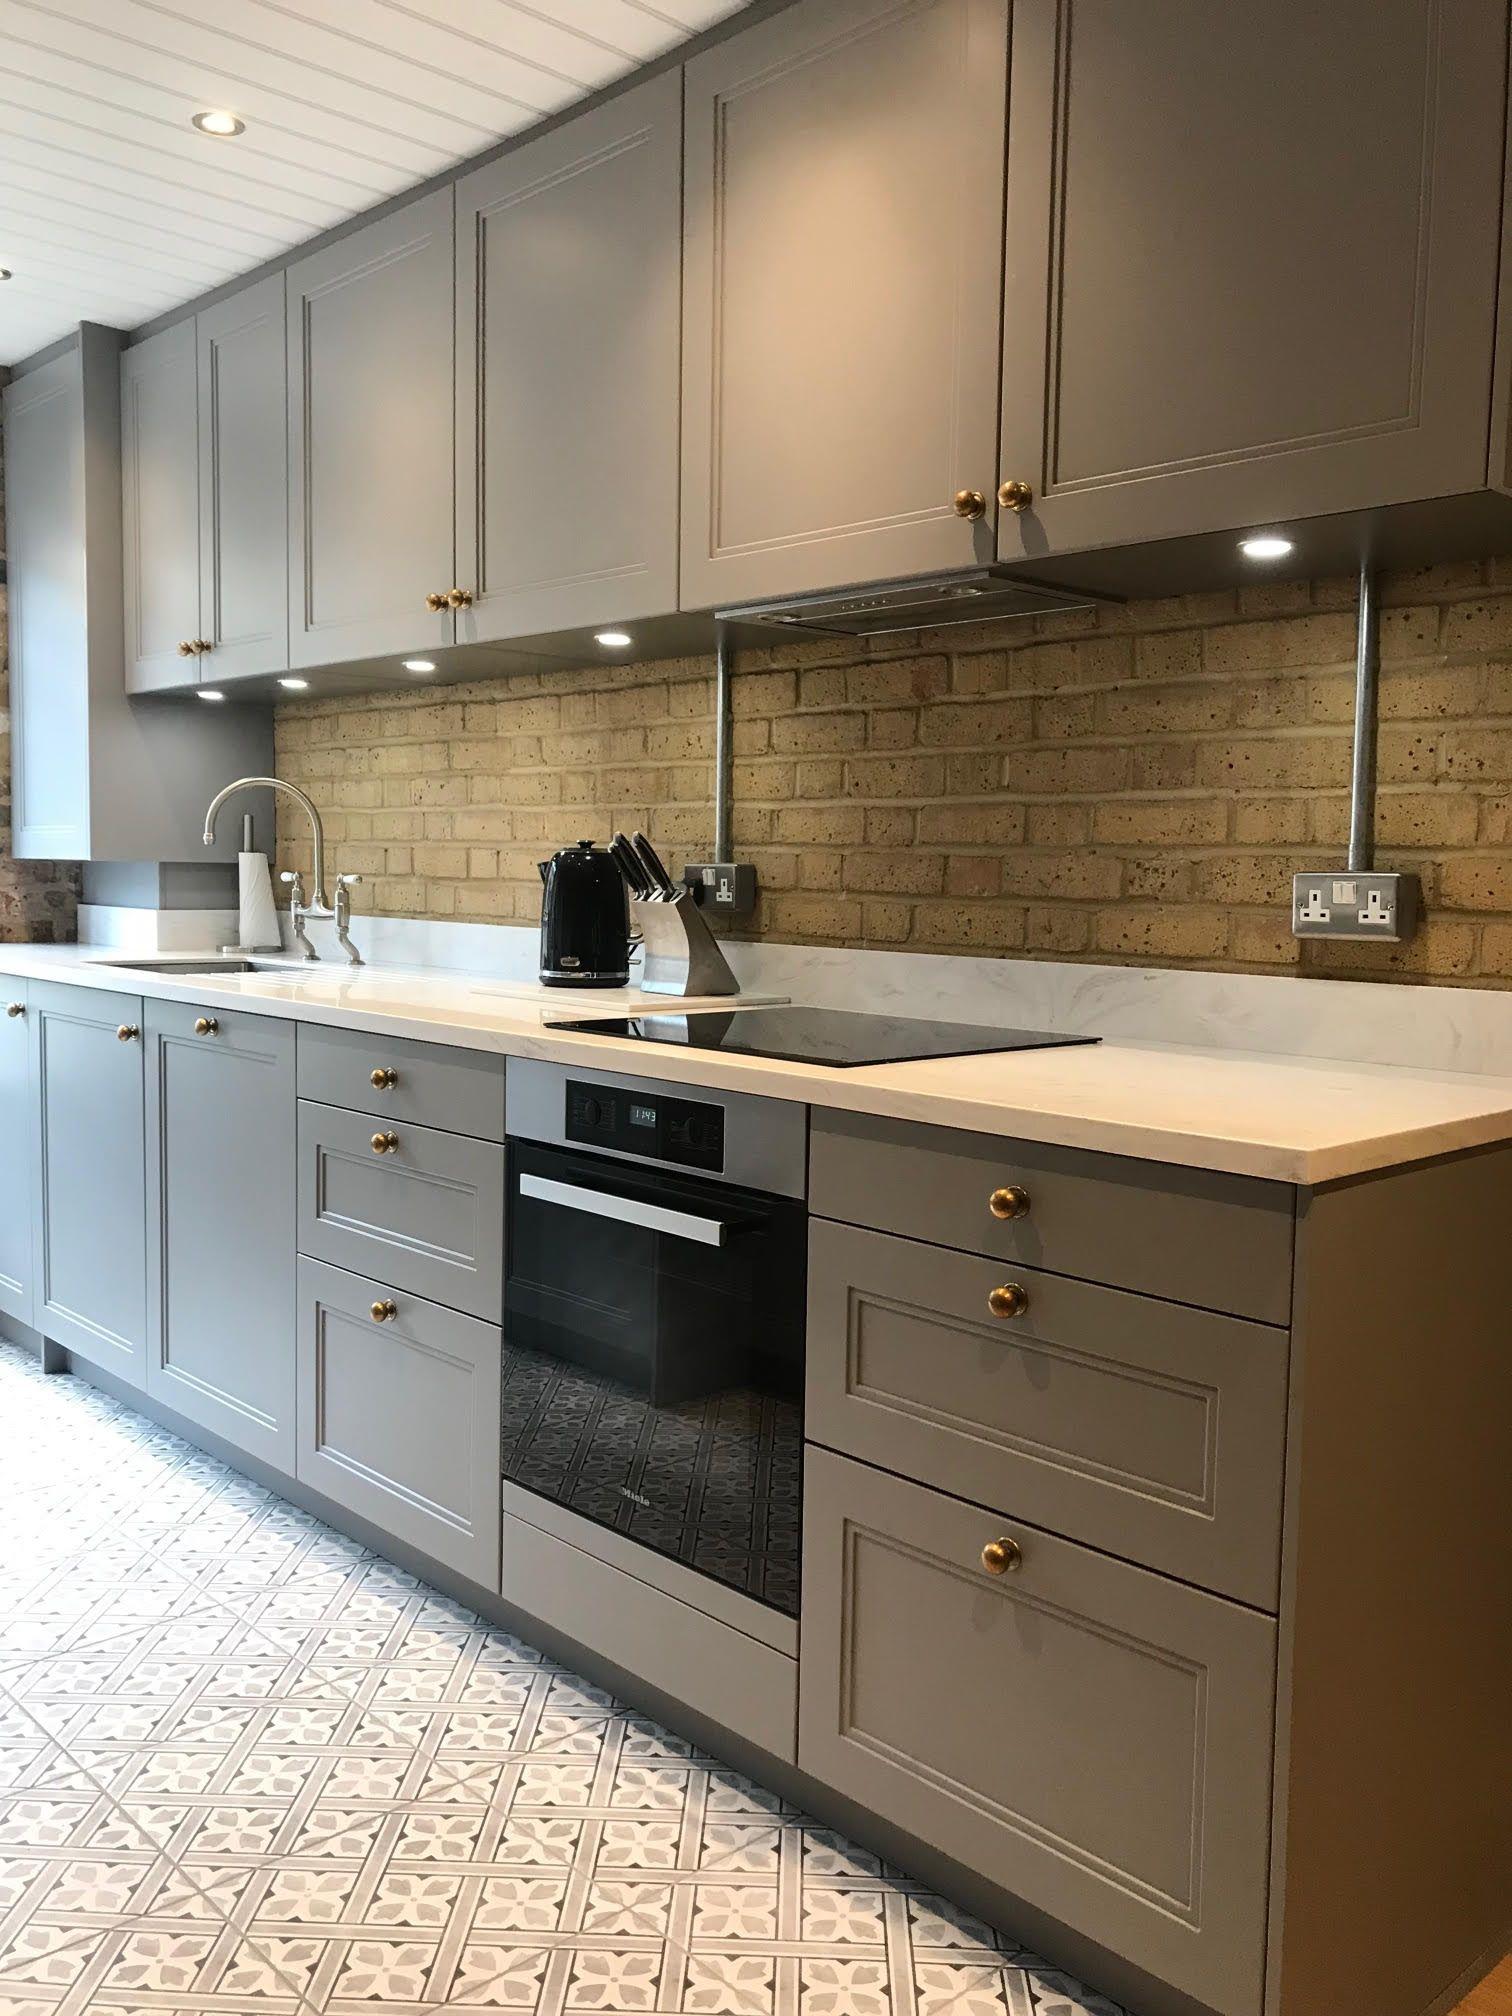 Beautiful Bespoke Kitchens Luxury Fitted Furniture One Wall Kitchen Kitchen Flooring Brick Kitchen